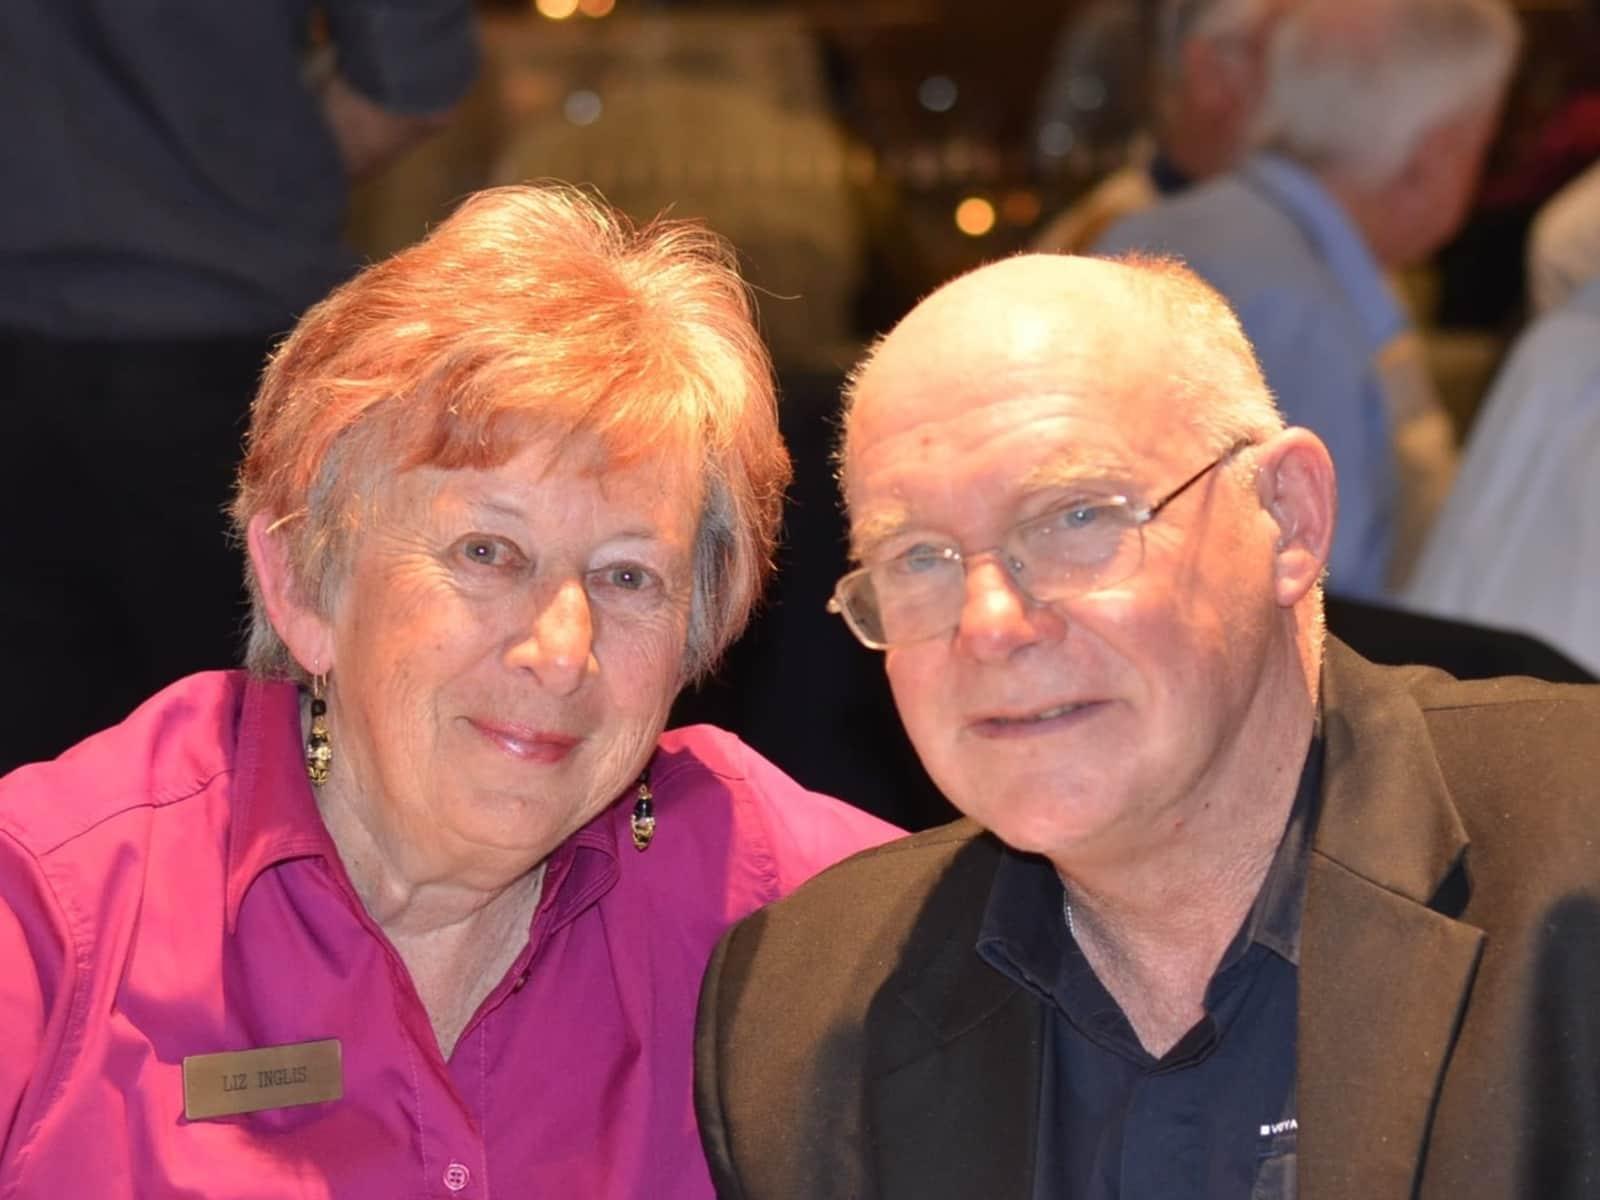 Elisabeth & Hugh from Thirroul, New South Wales, Australia